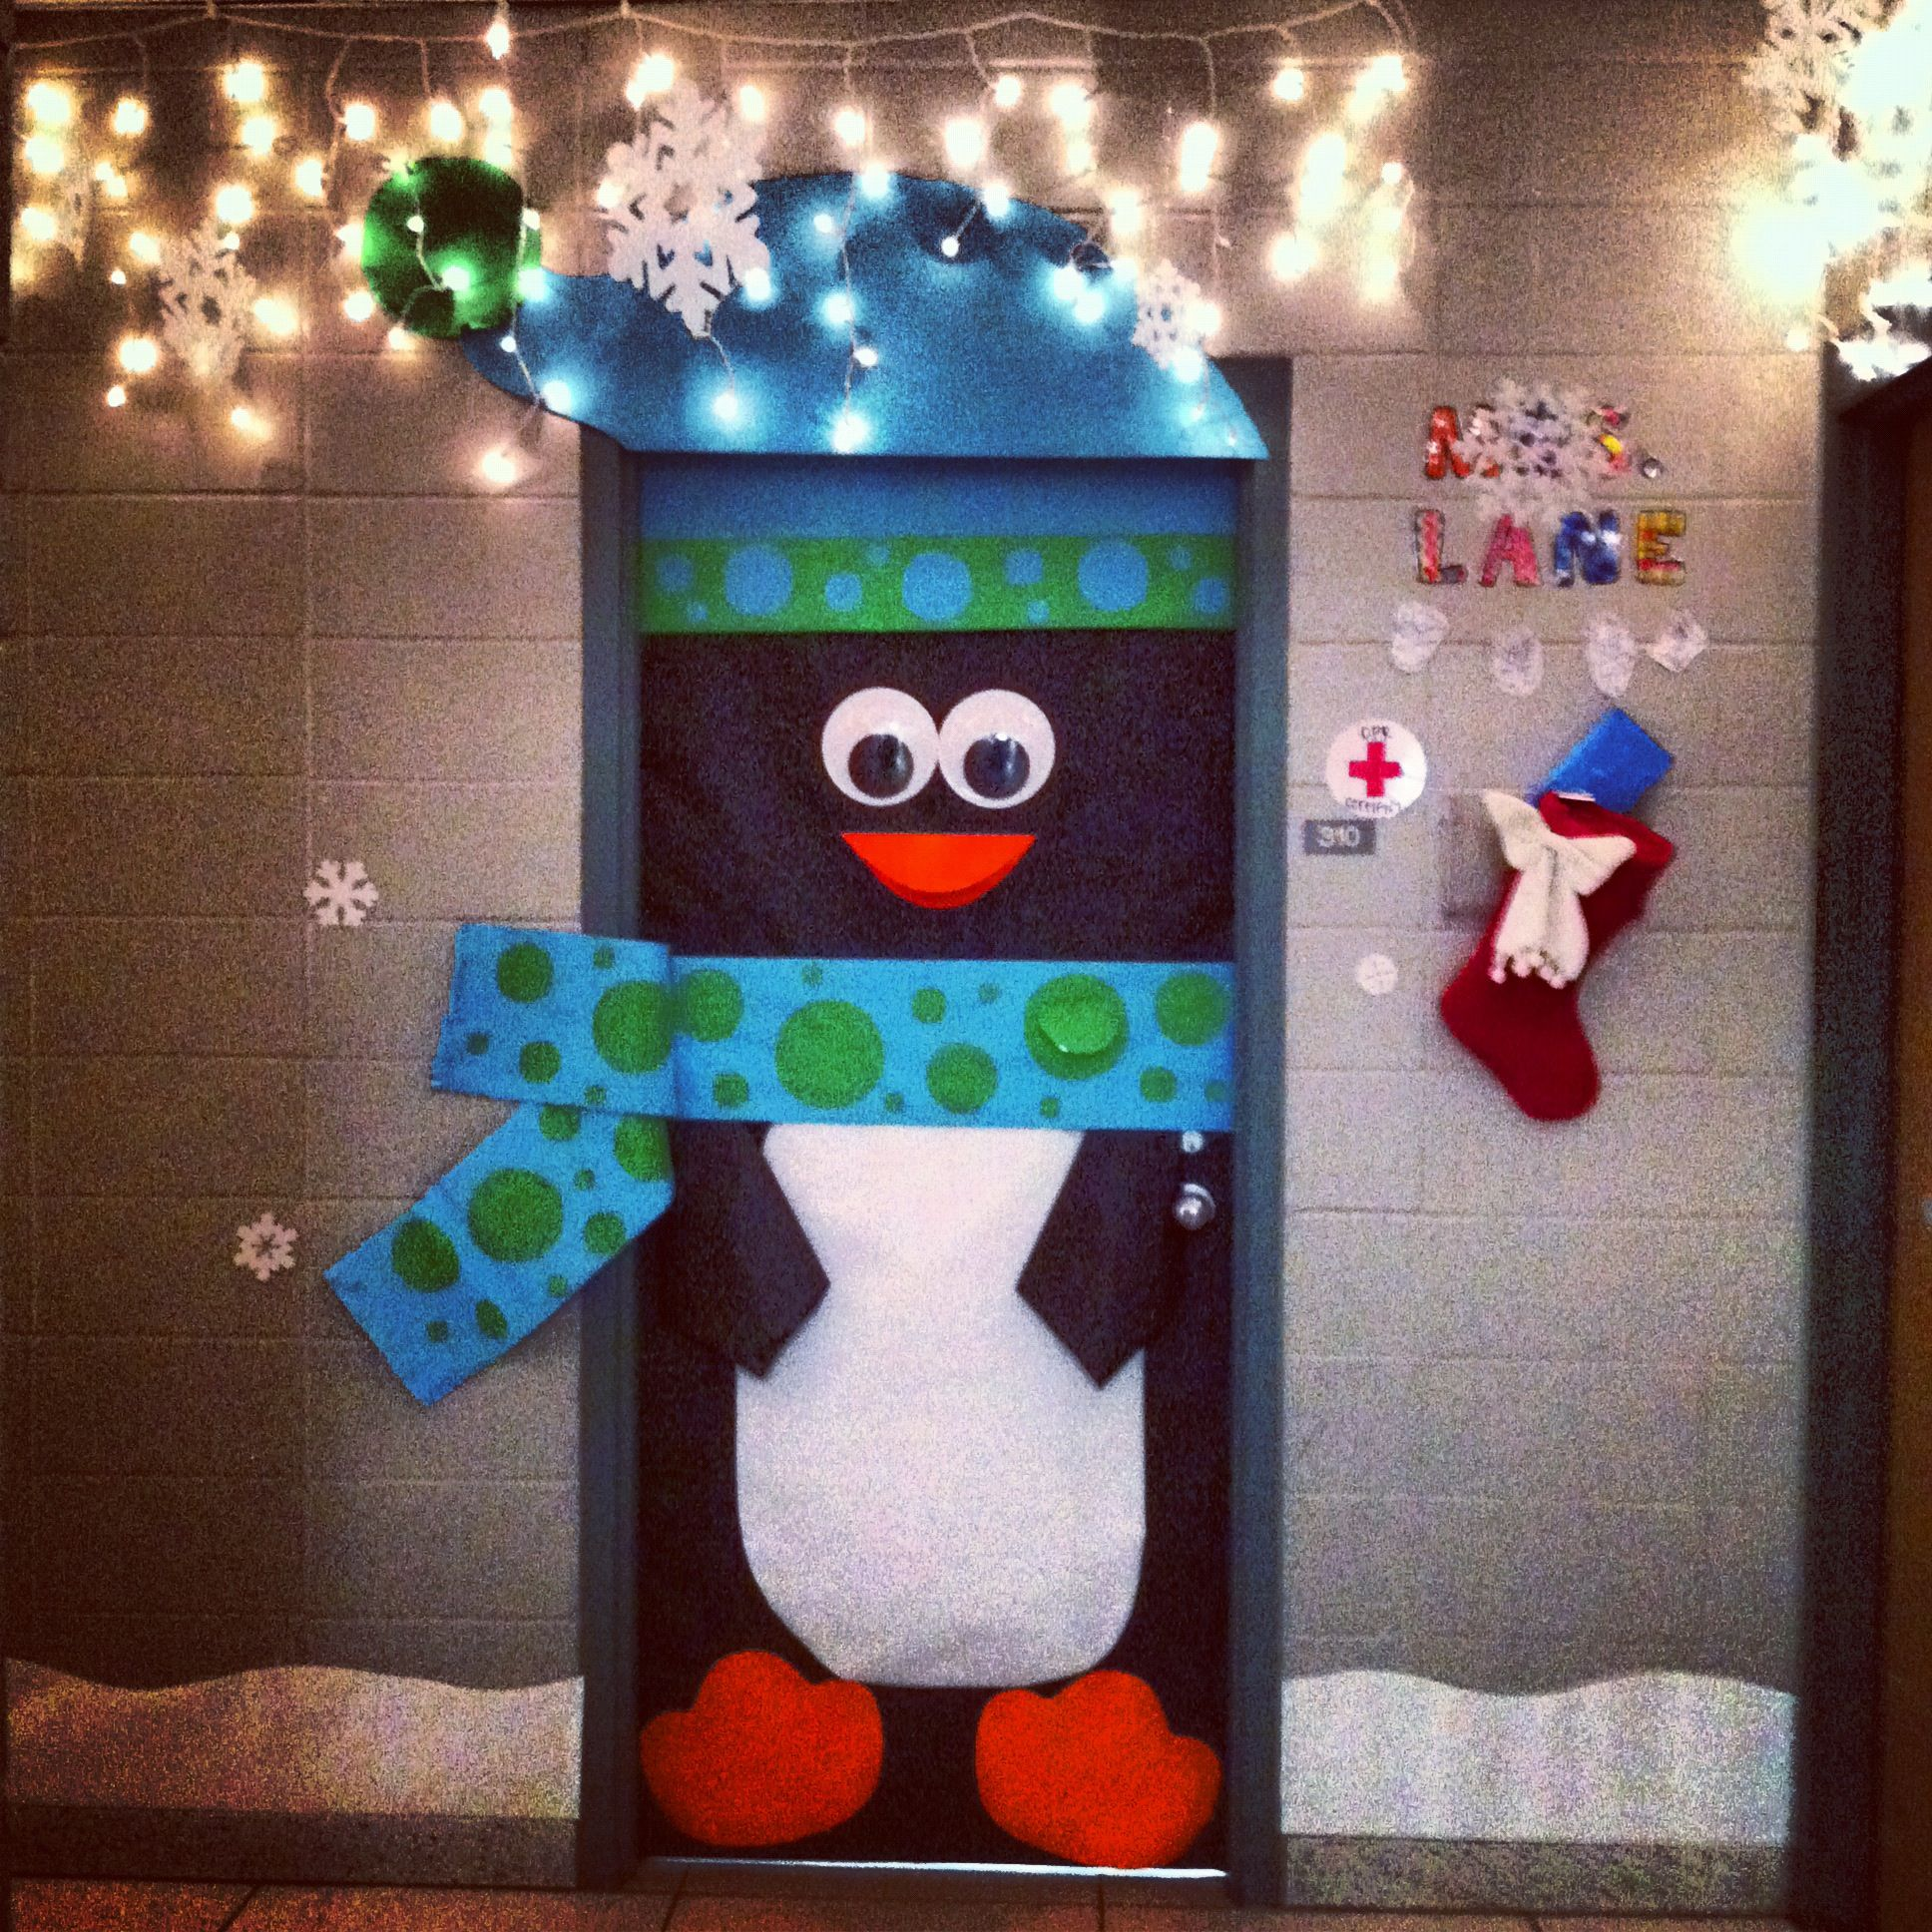 My Classroom door :) HAPPY HOLIDAYS!